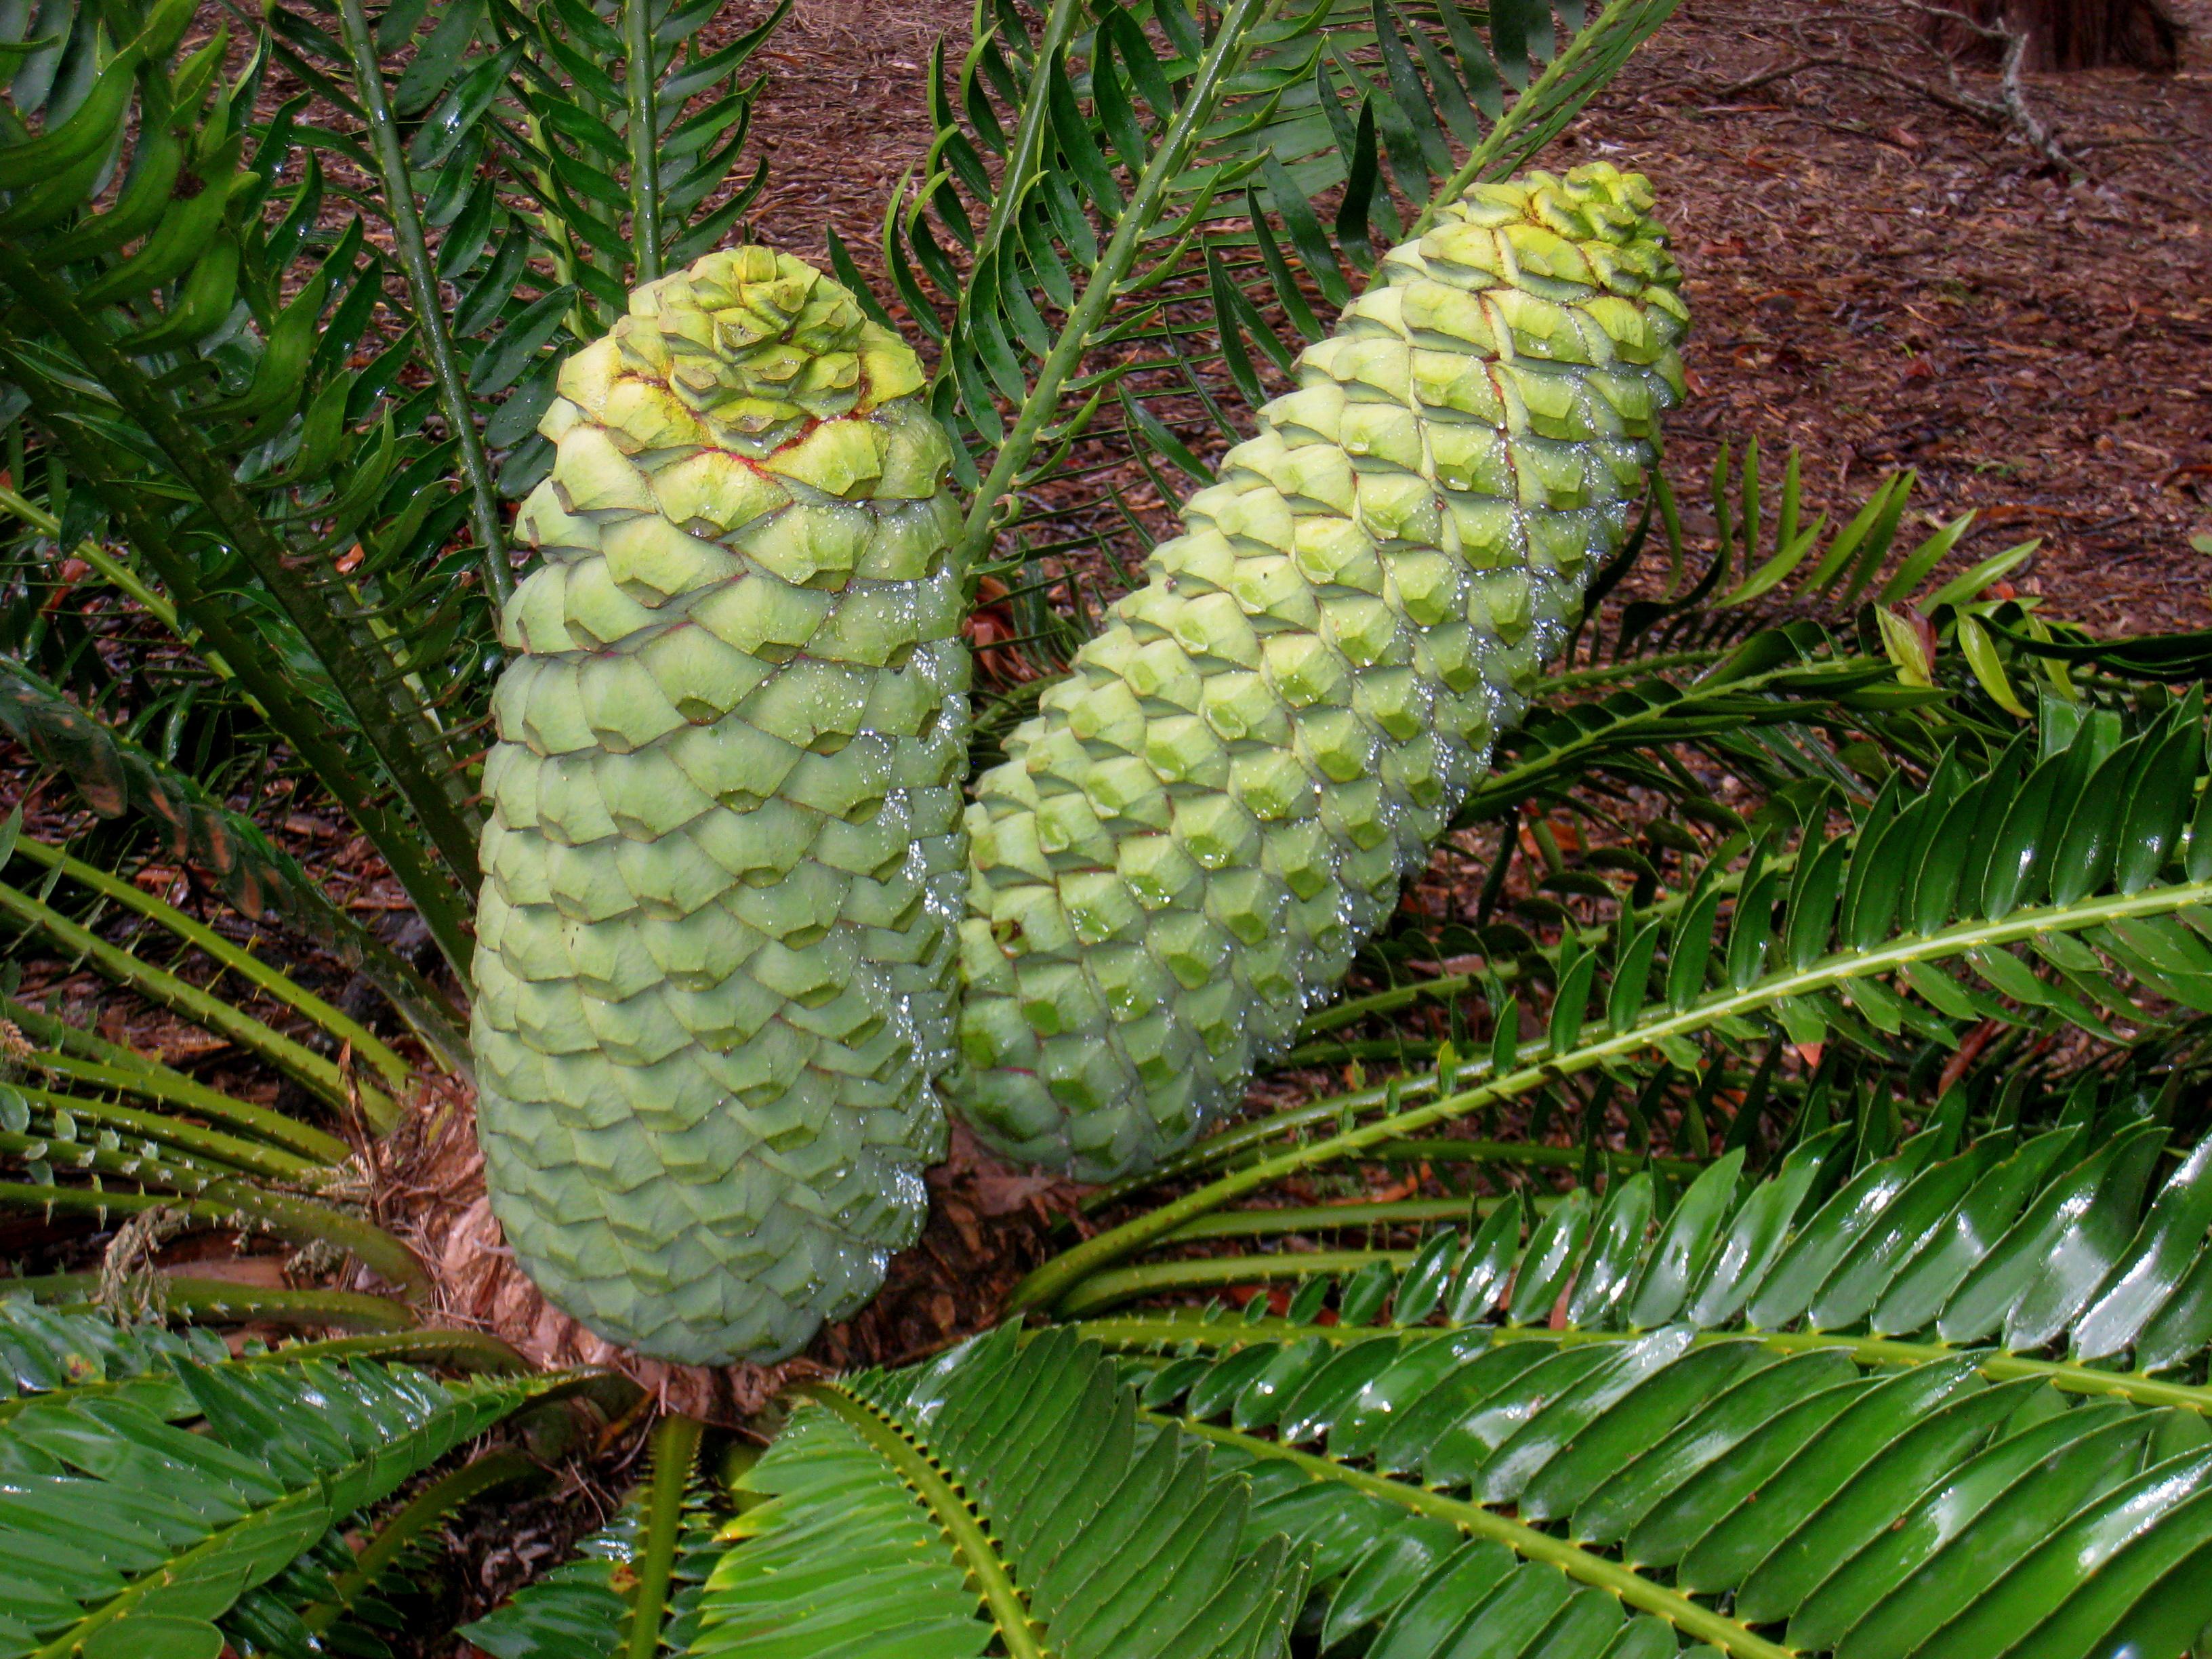 File Encephalartos Turneri Koko Crater Botanical Garden Img 2329 Jpg Wikimedia Commons